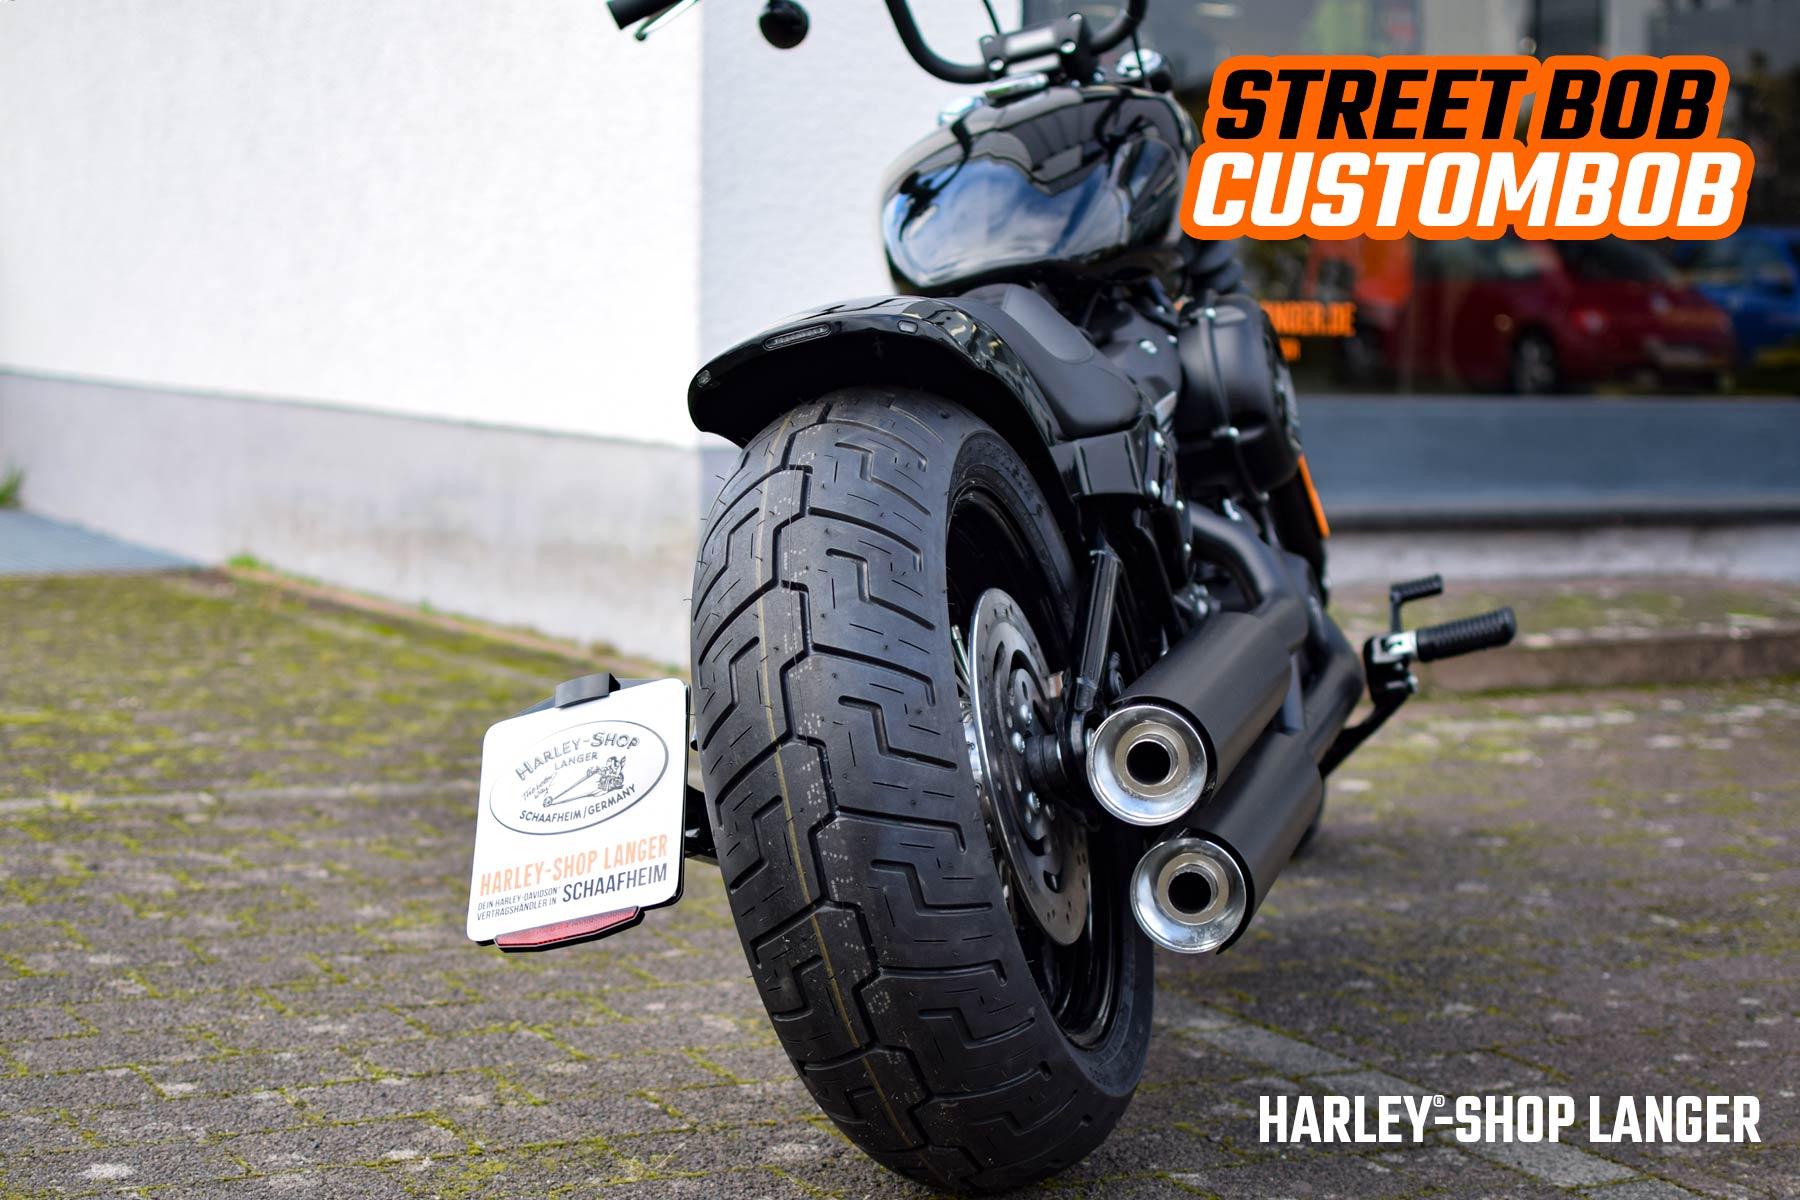 Harley-Shop Langer - Street Bob Custombob Umbau